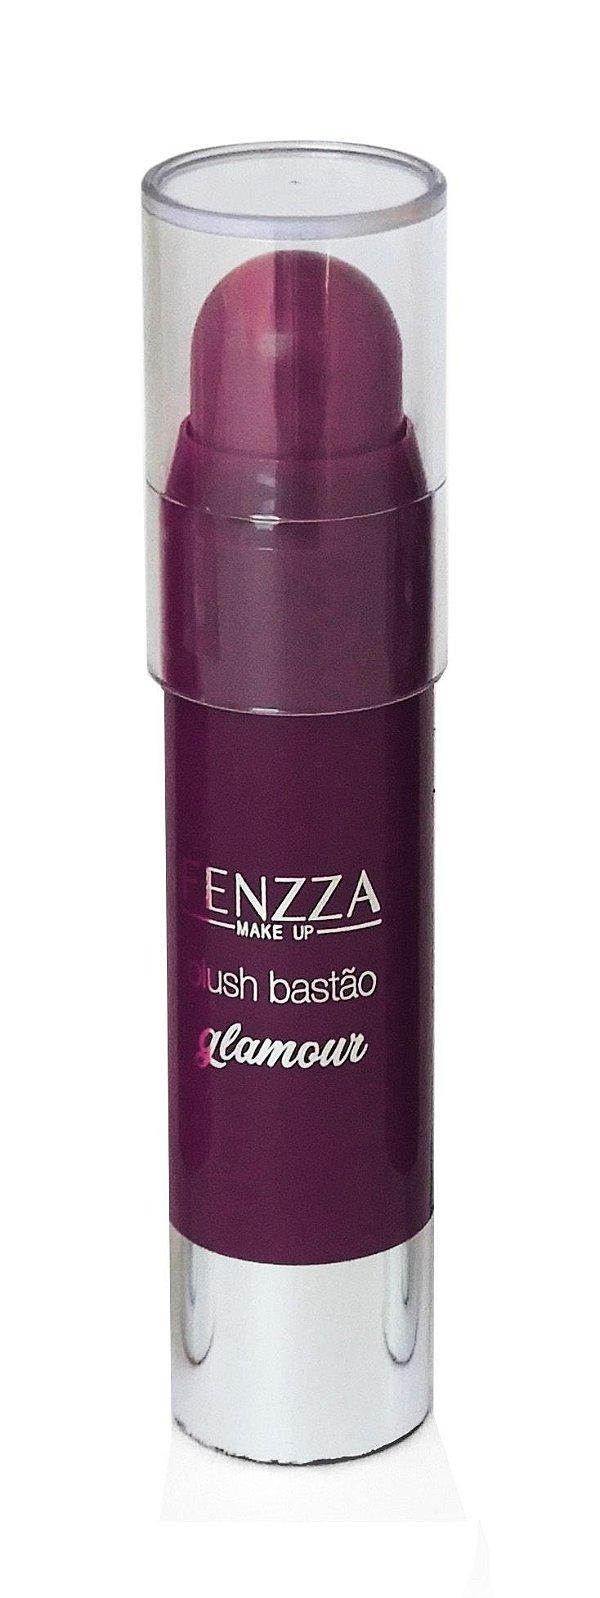 blush bastão glamour Fenzza Make Up - c6